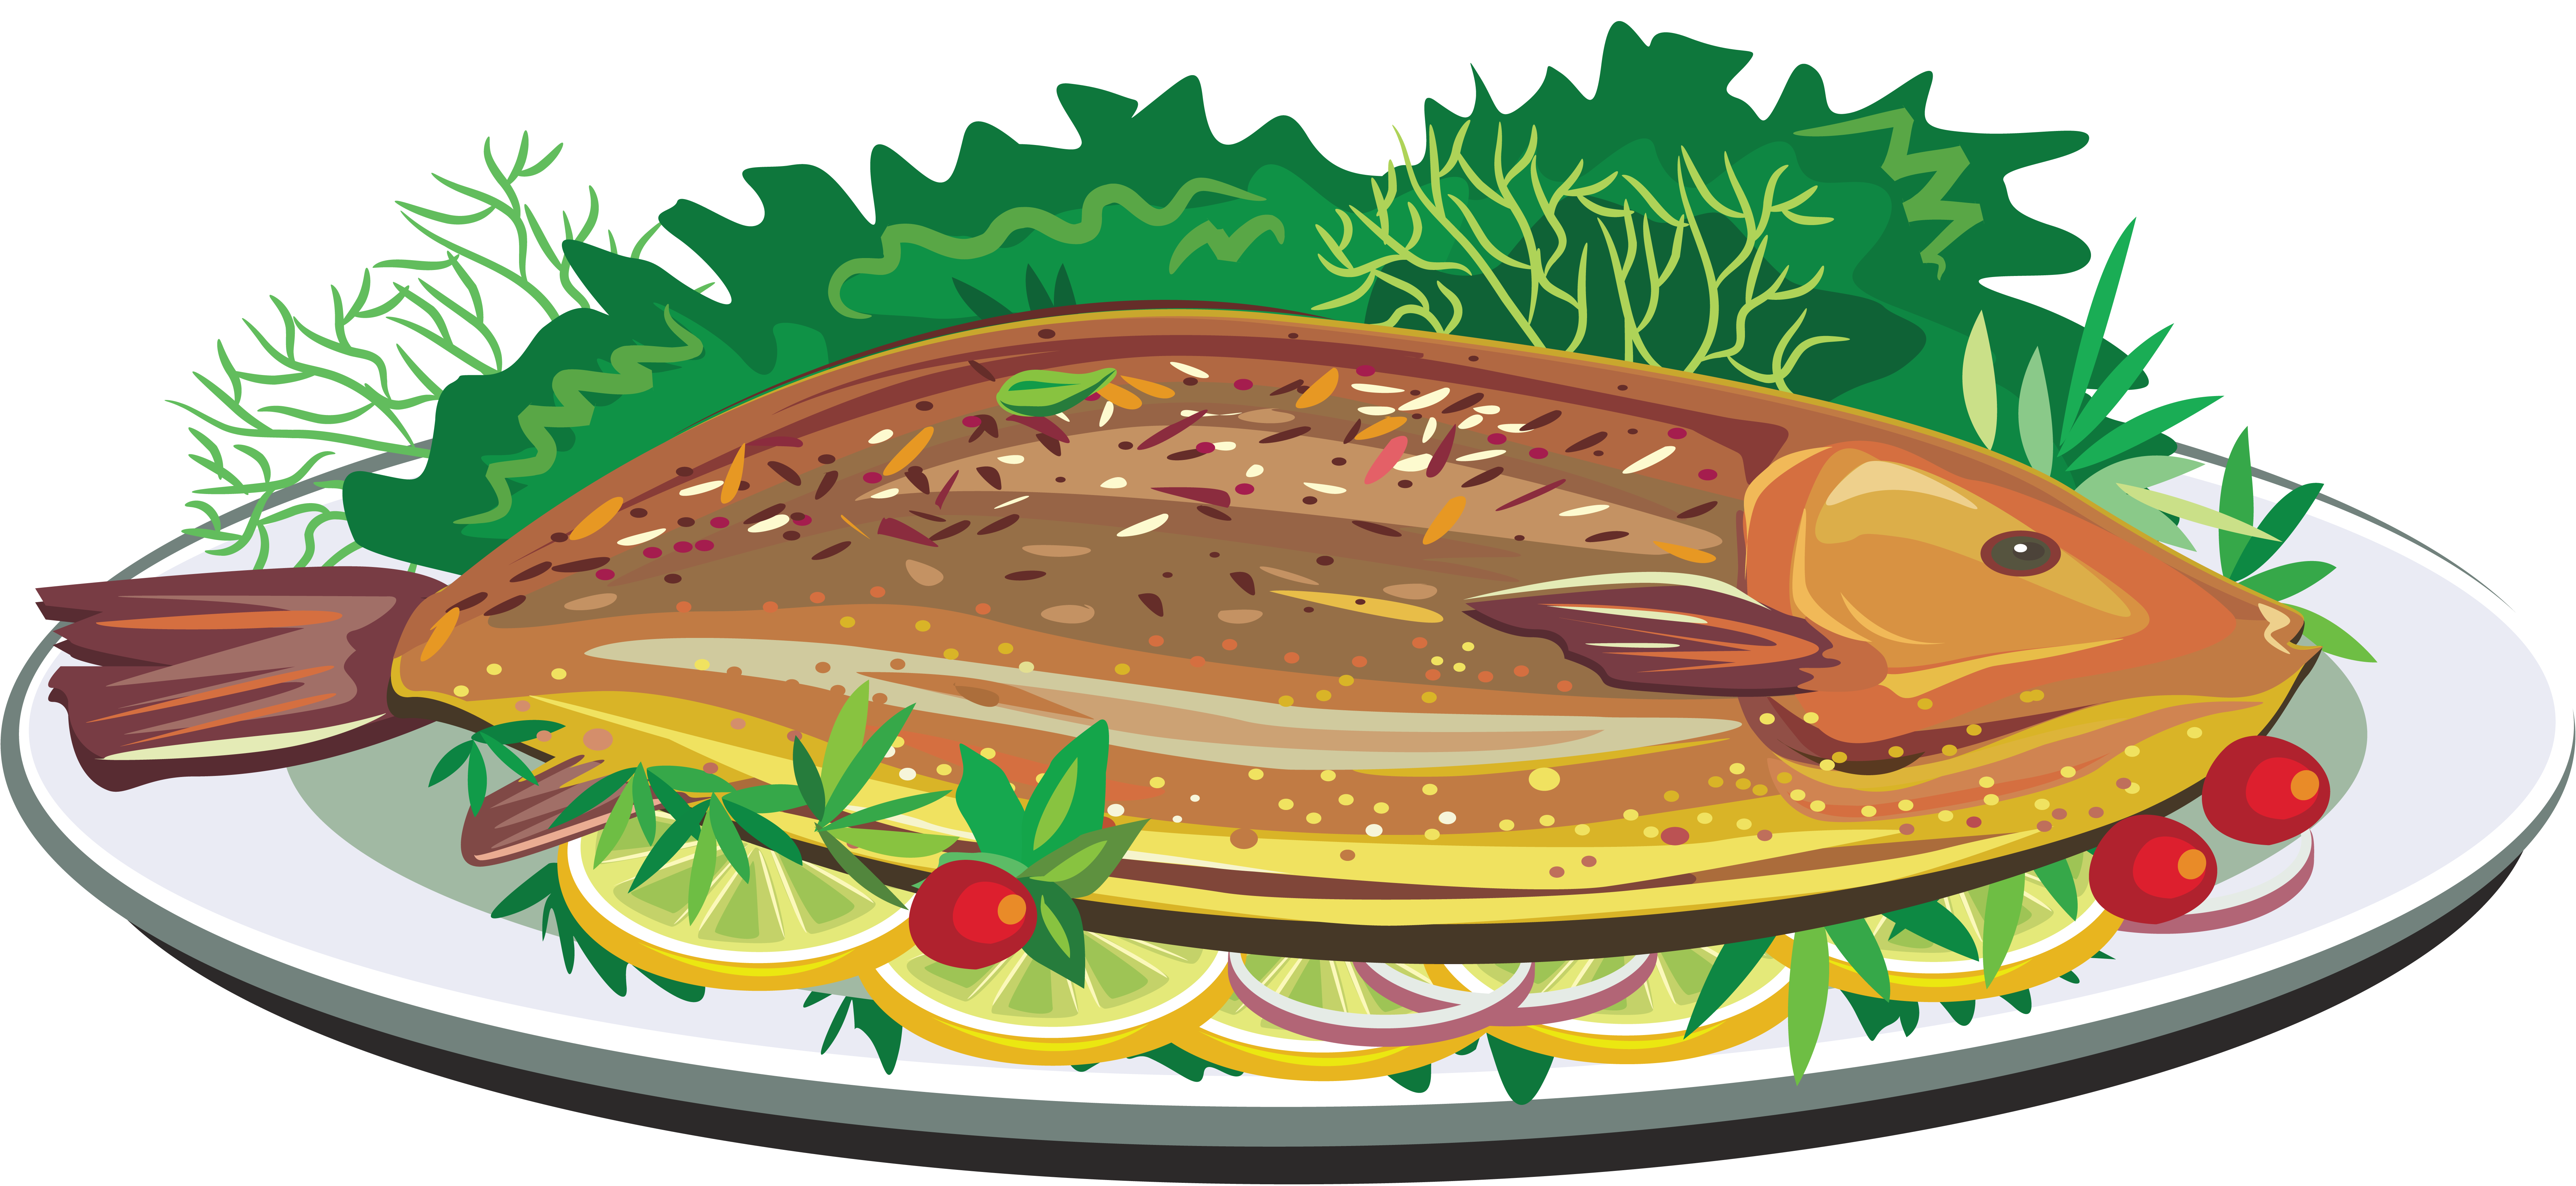 Fried dish clip art. Clipart fish food